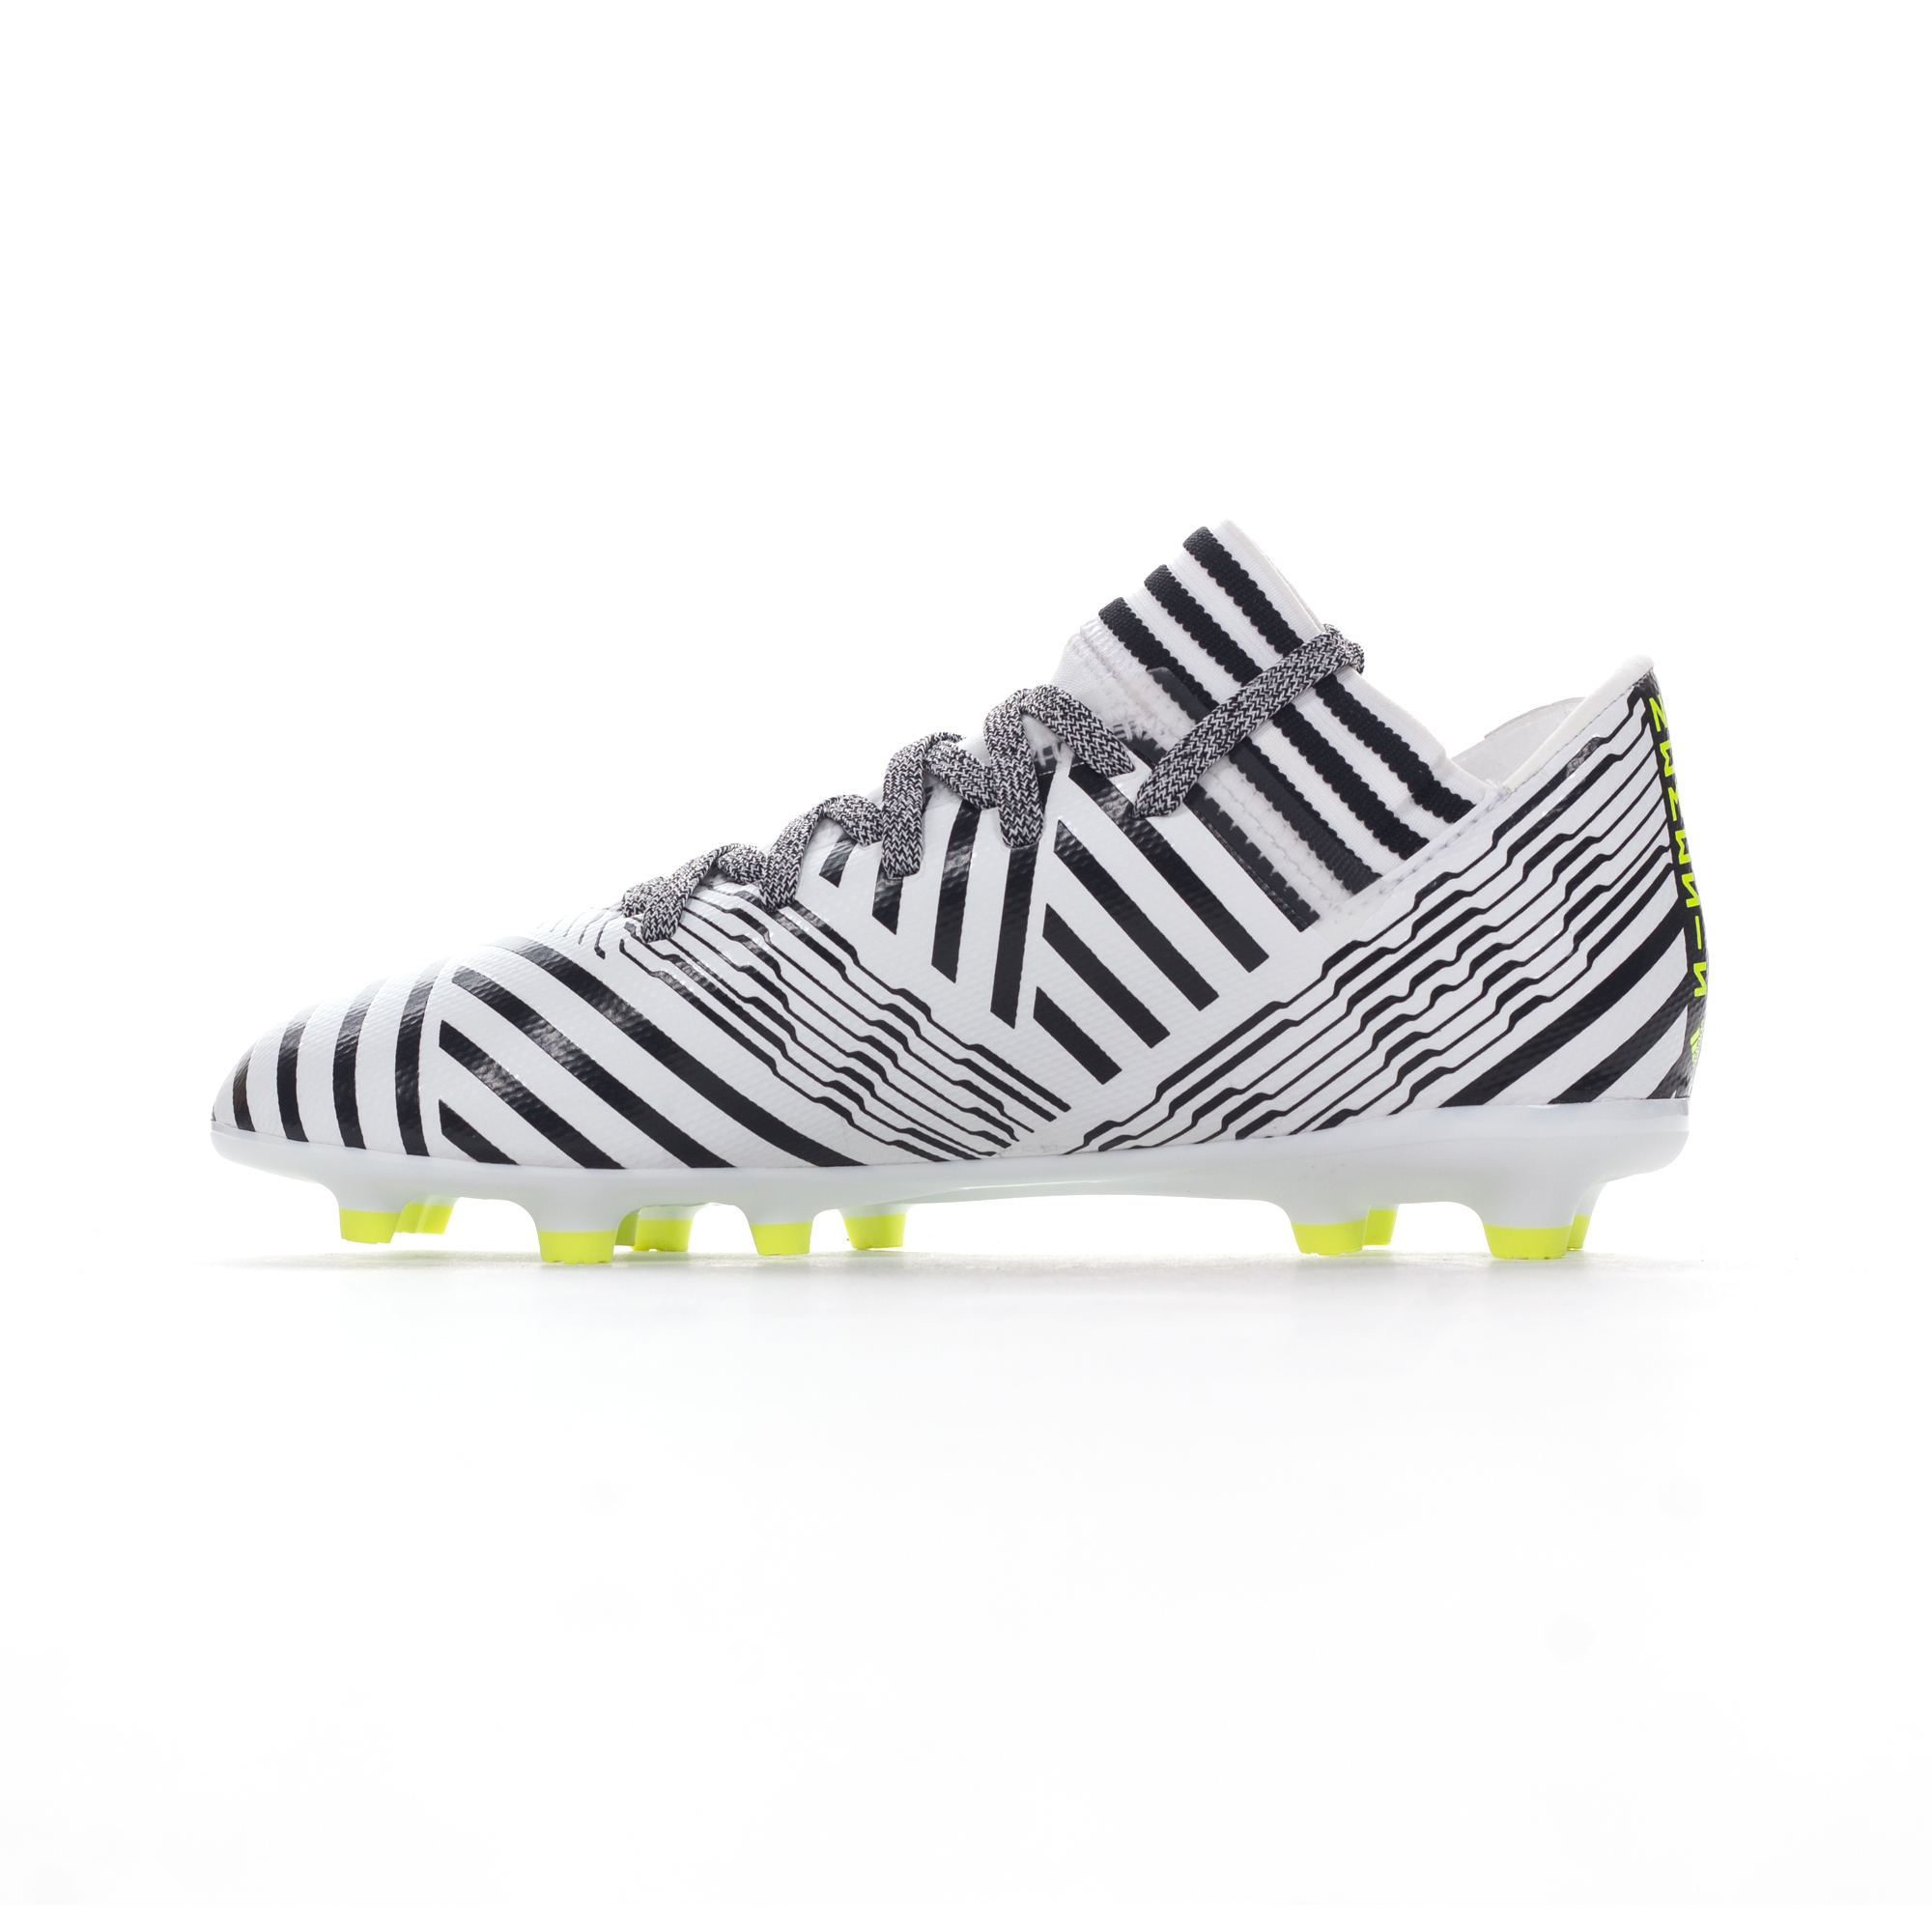 d03d9b0d50a adidas Nemeziz 17.3 FG Kids Football Boot White Black Dust Storm - UK 10